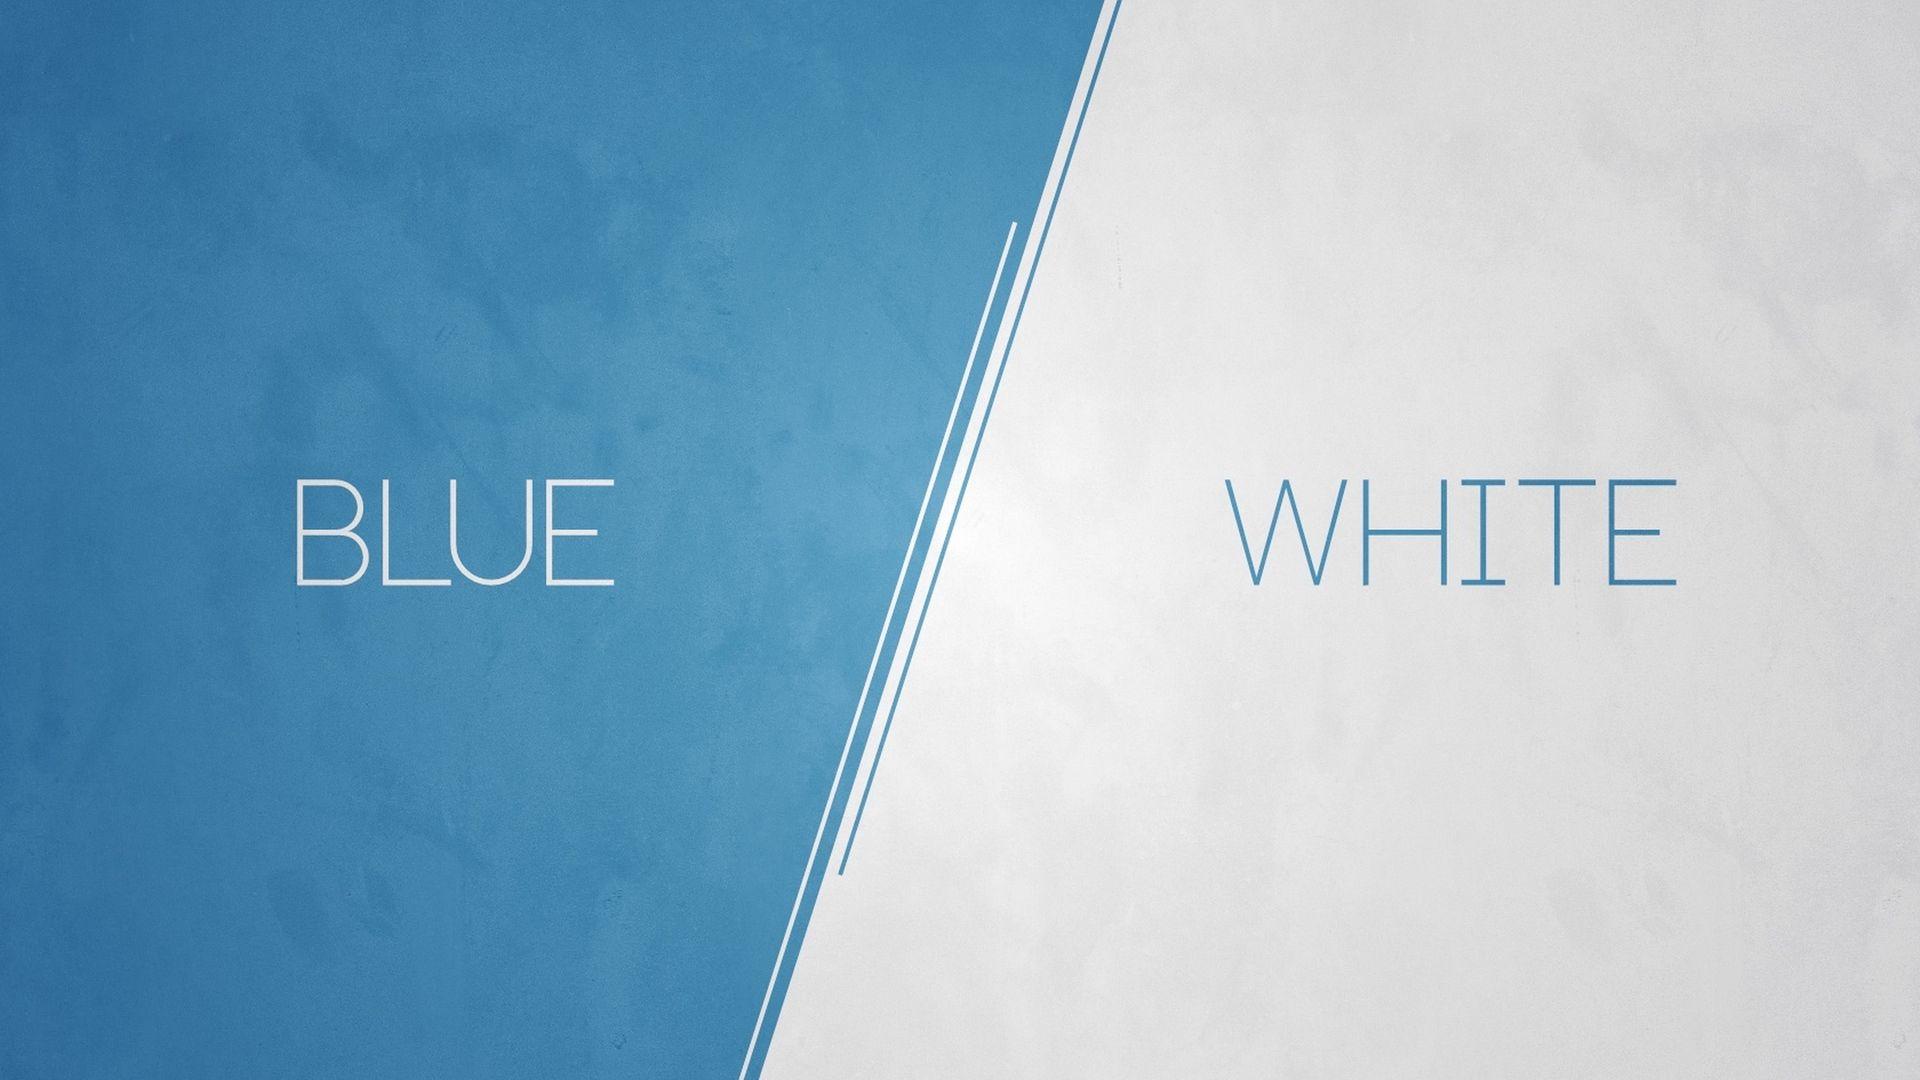 White Minimalism HD 1080 wallpaper